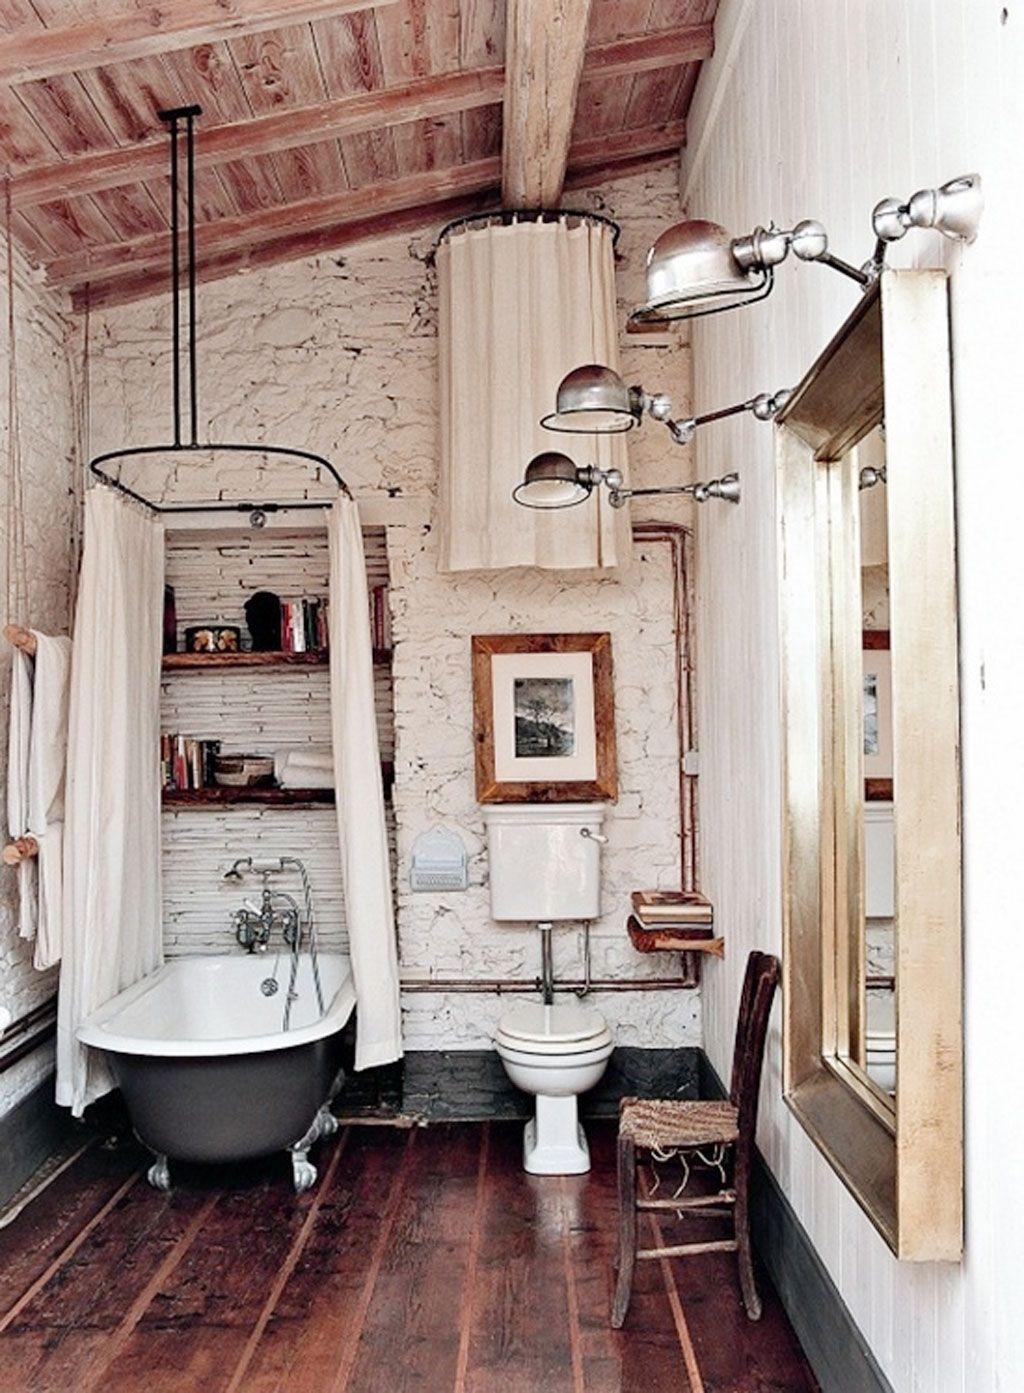 small half bathroom ideas 034 Photo small half bathroom small half bathroom ideas 034 Photo small half bathroom ideas 034